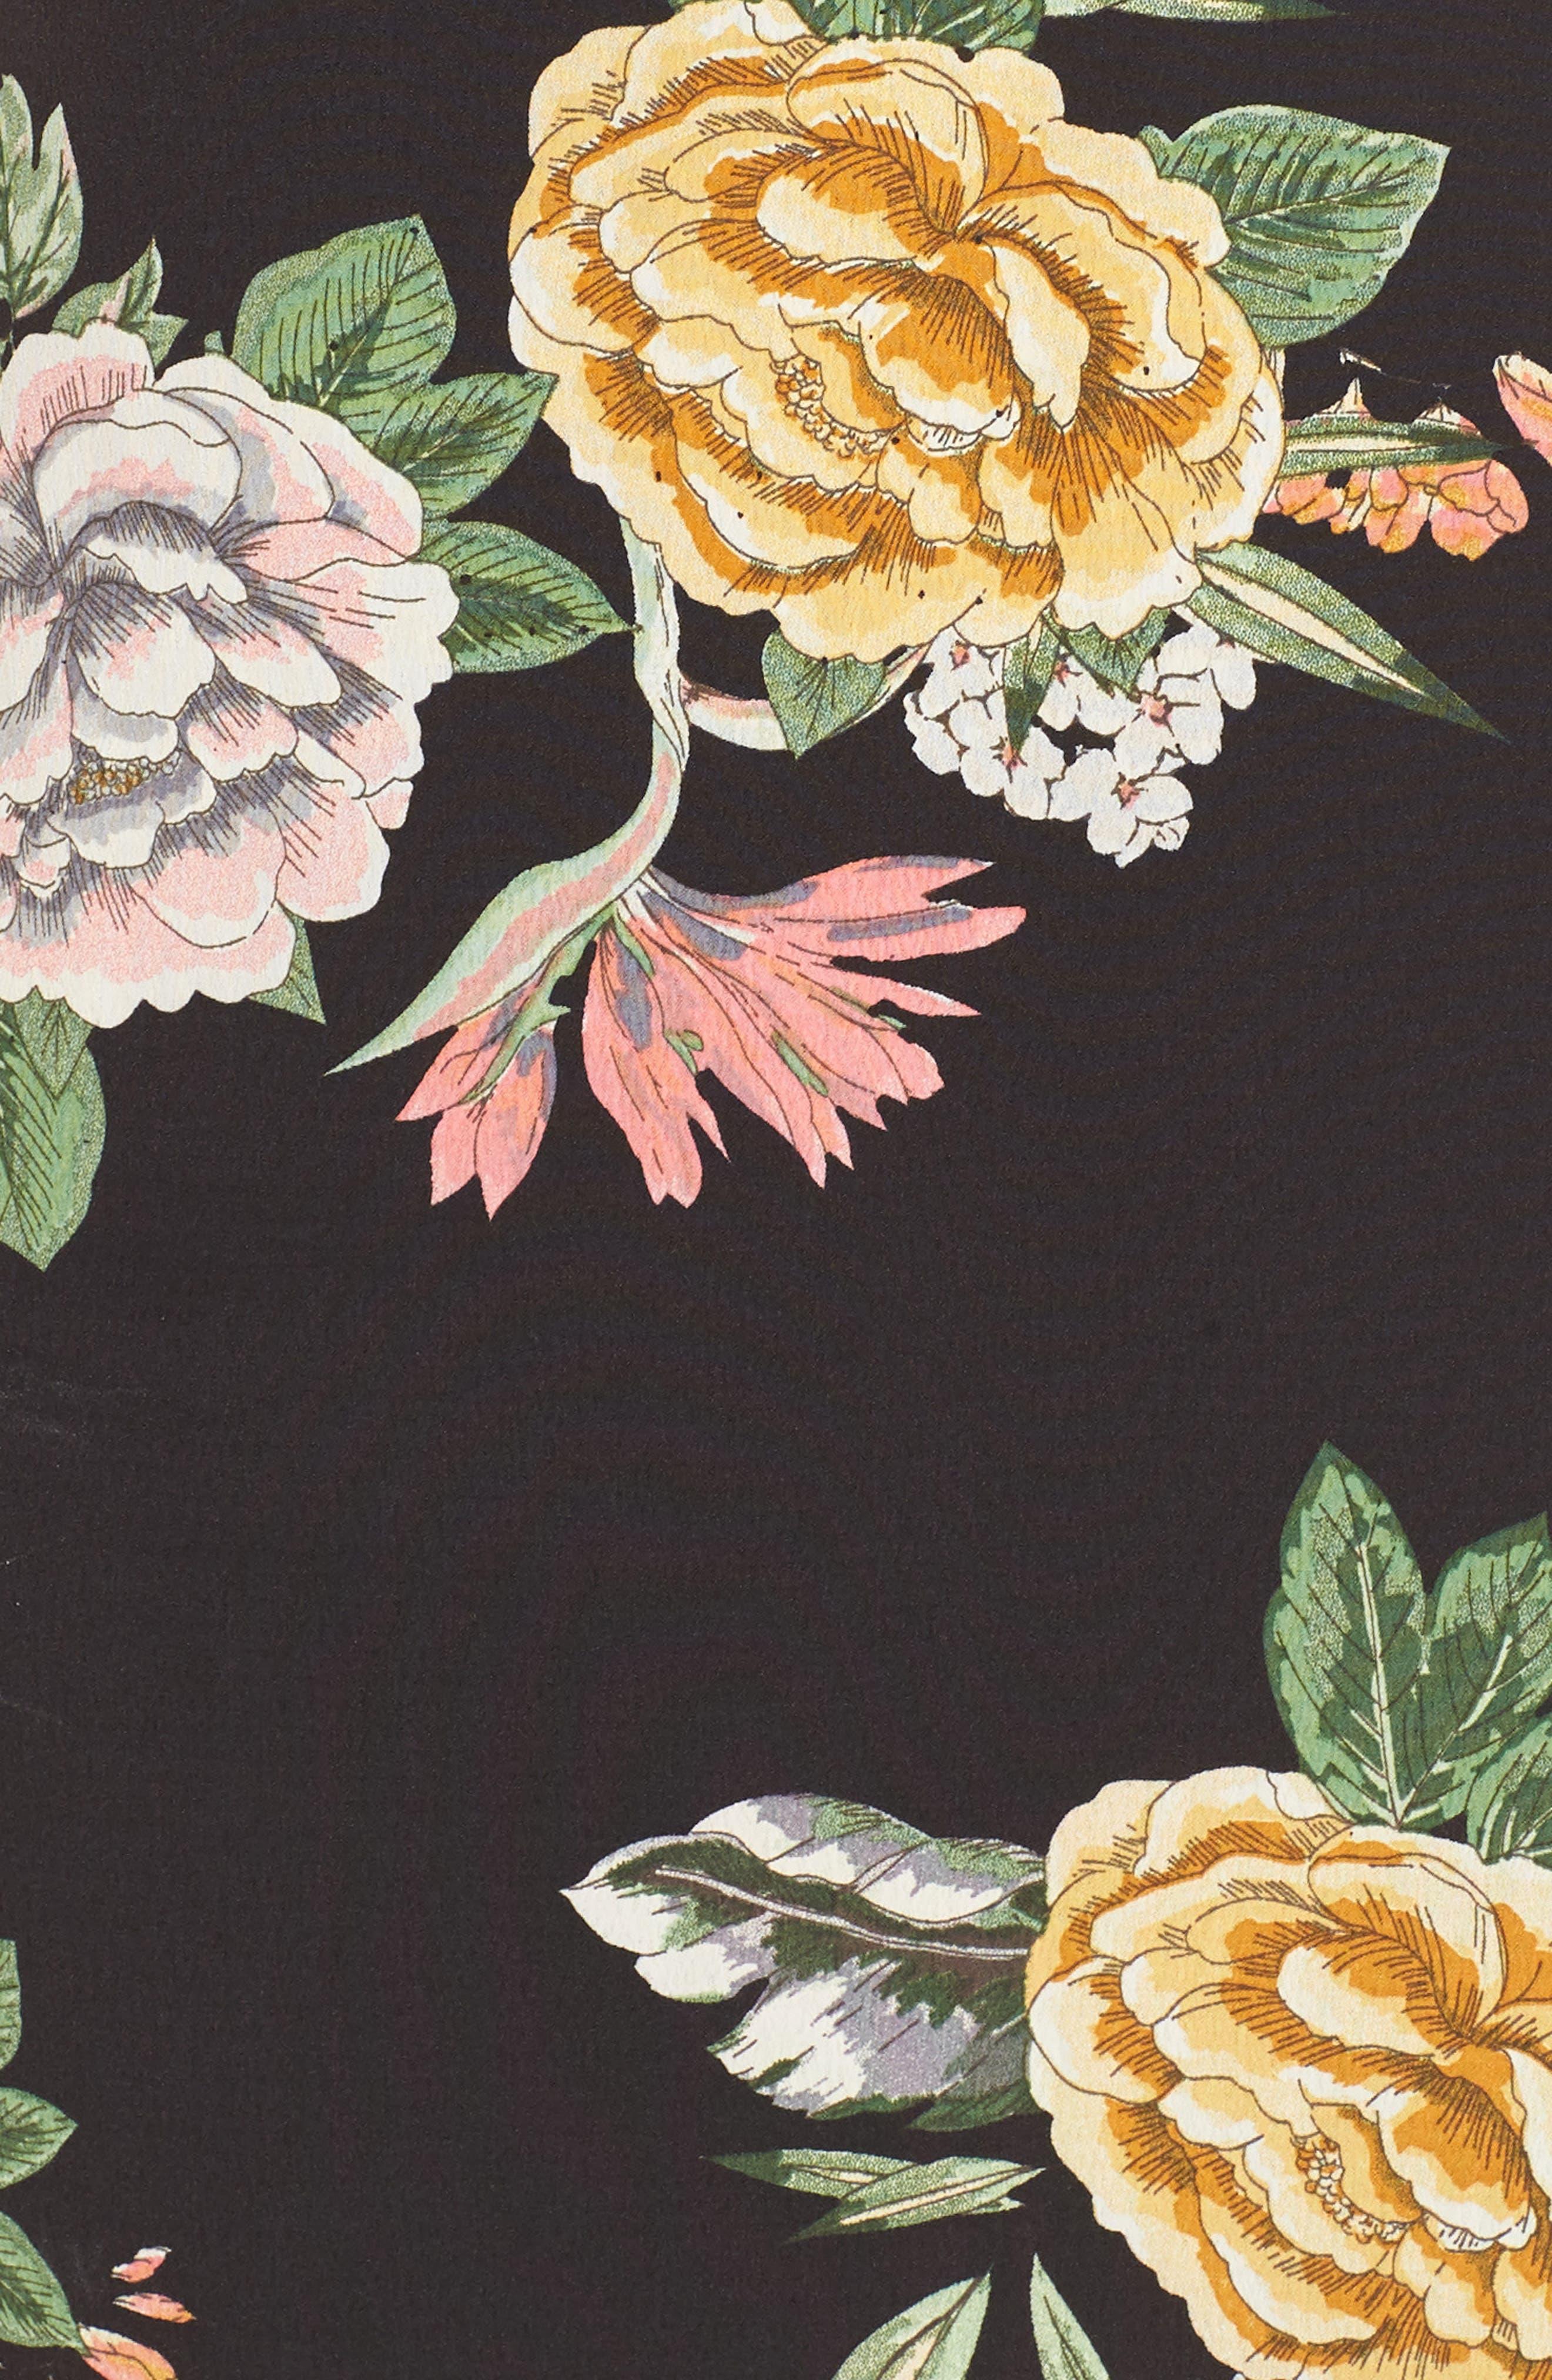 Enchanted Garden Lace-Up Dress,                             Alternate thumbnail 6, color,                             ENCHANTED GARDEN PRINT